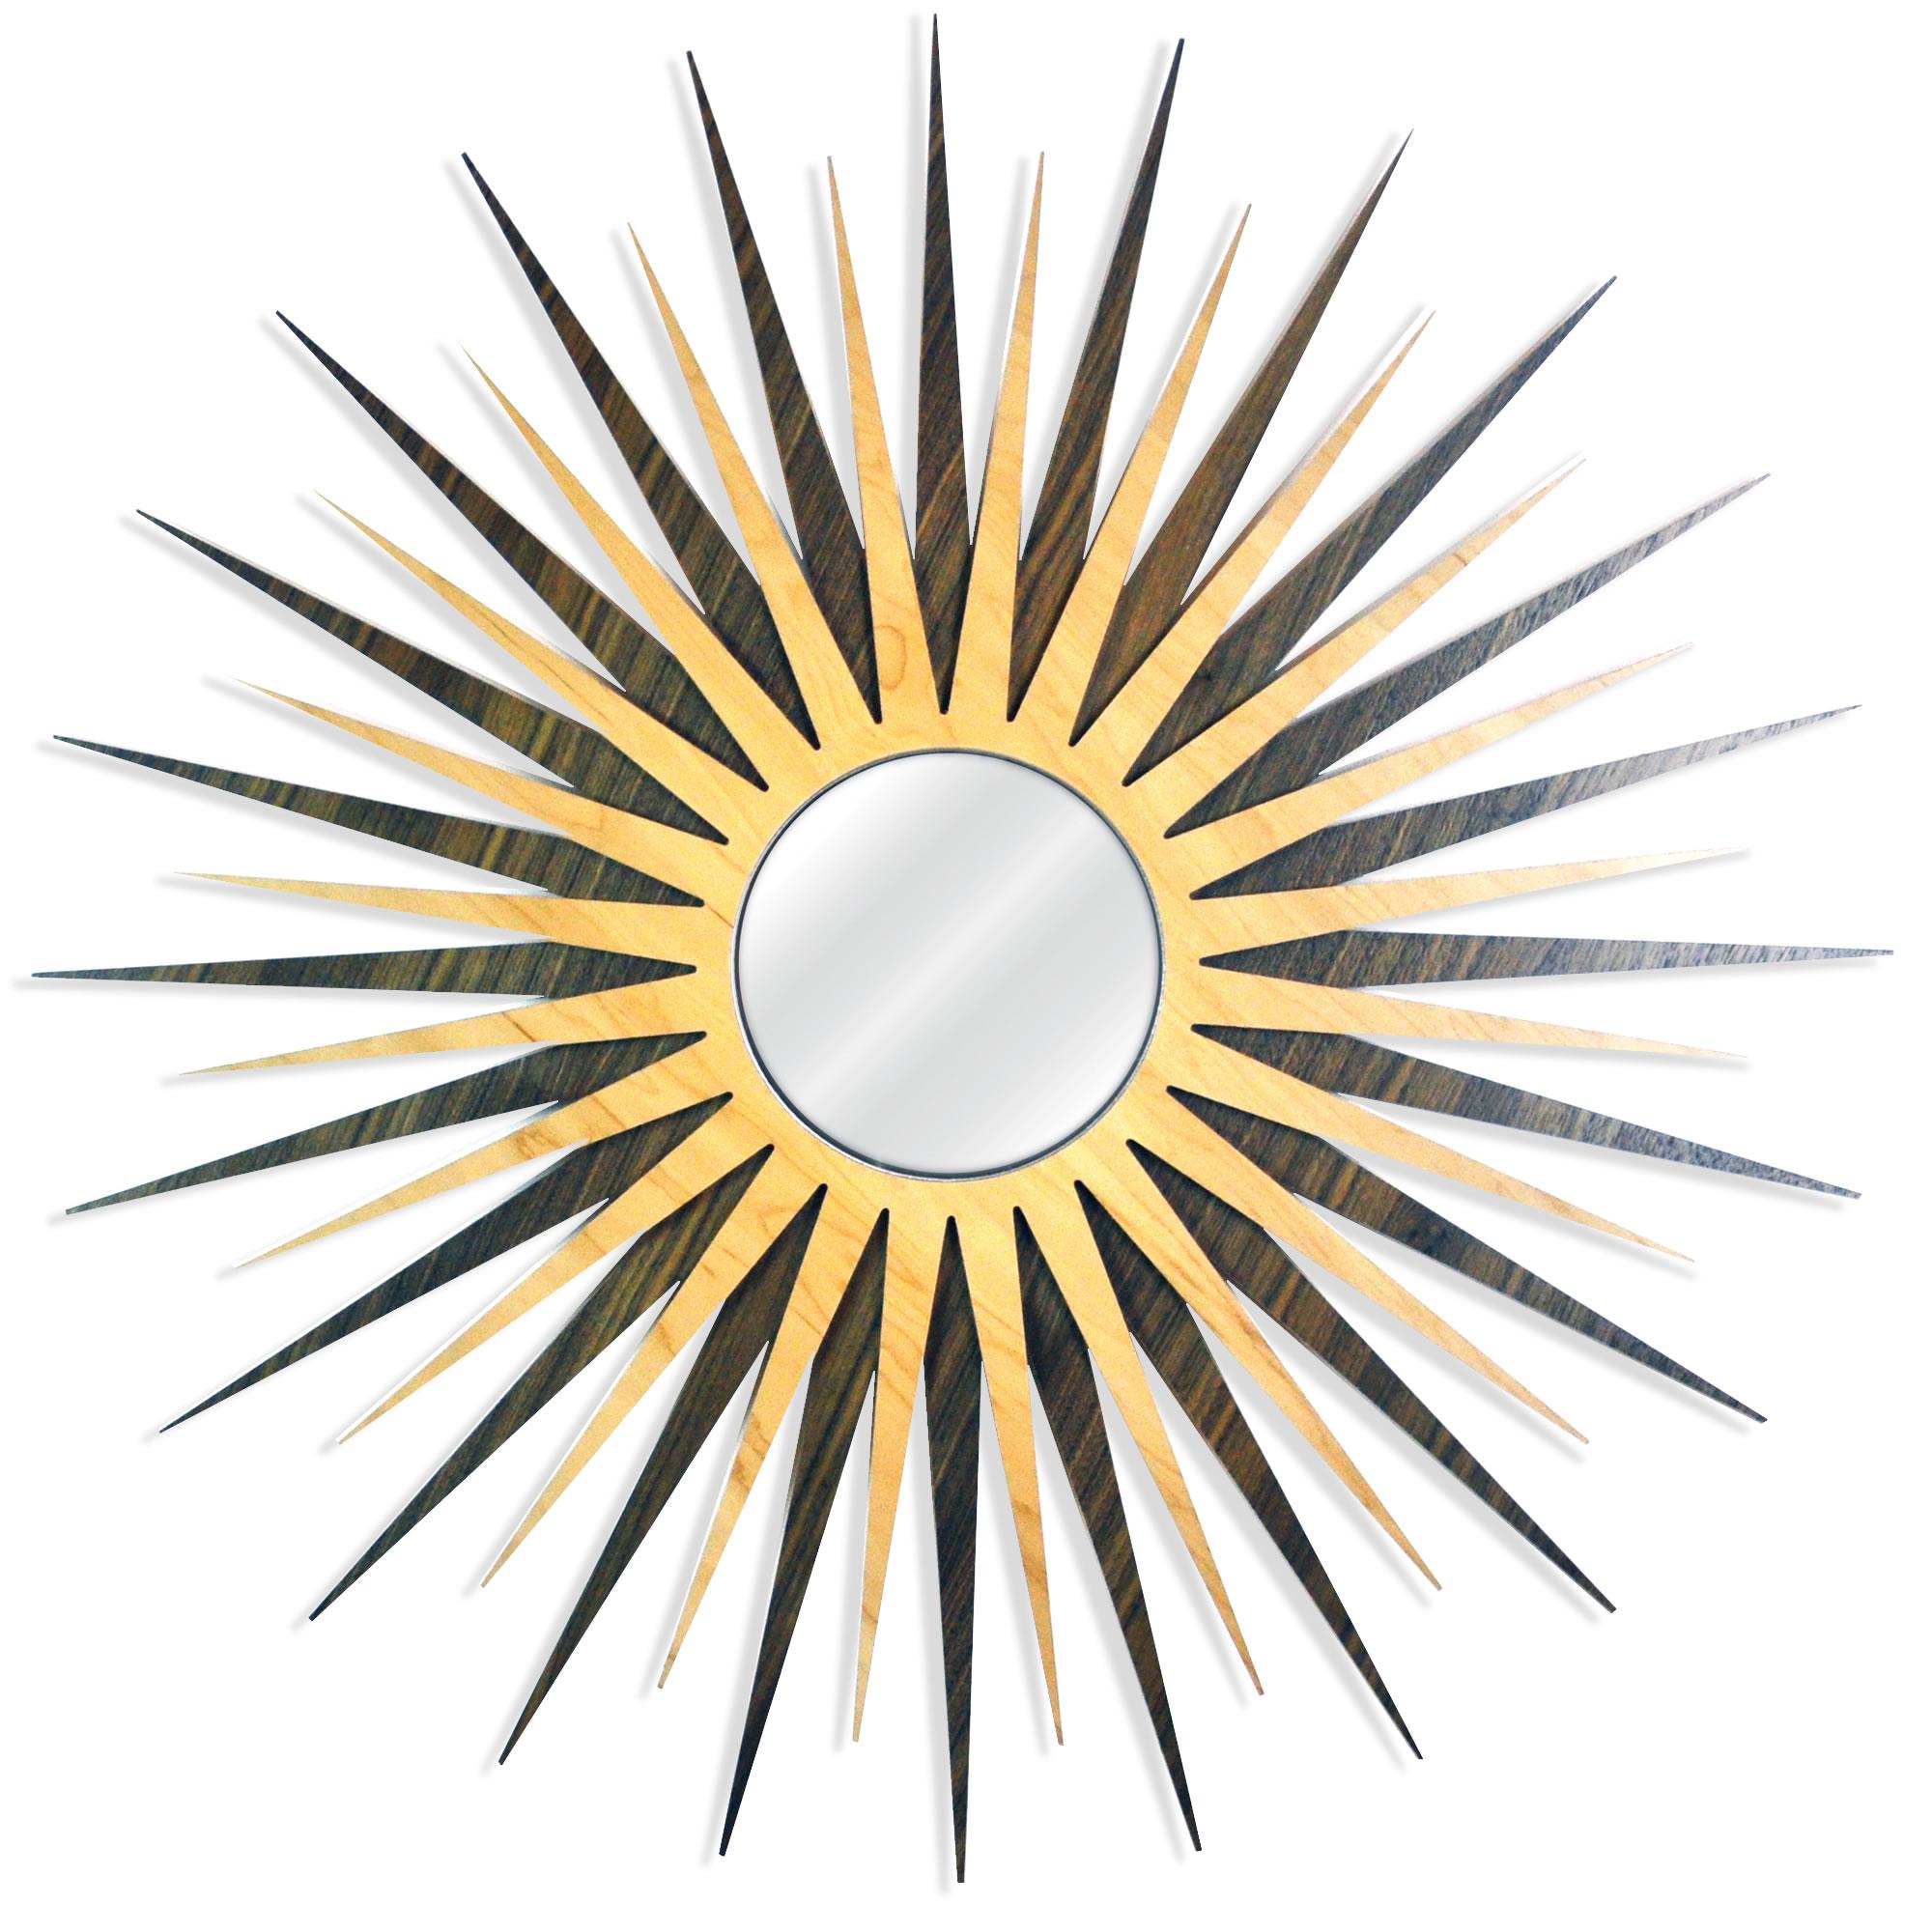 Midcentury Modern Decor 'MCM Starburst Mirror-Mahogany Maple' - Mahogany/Maple Plywood Wooden Sunburst Mirror